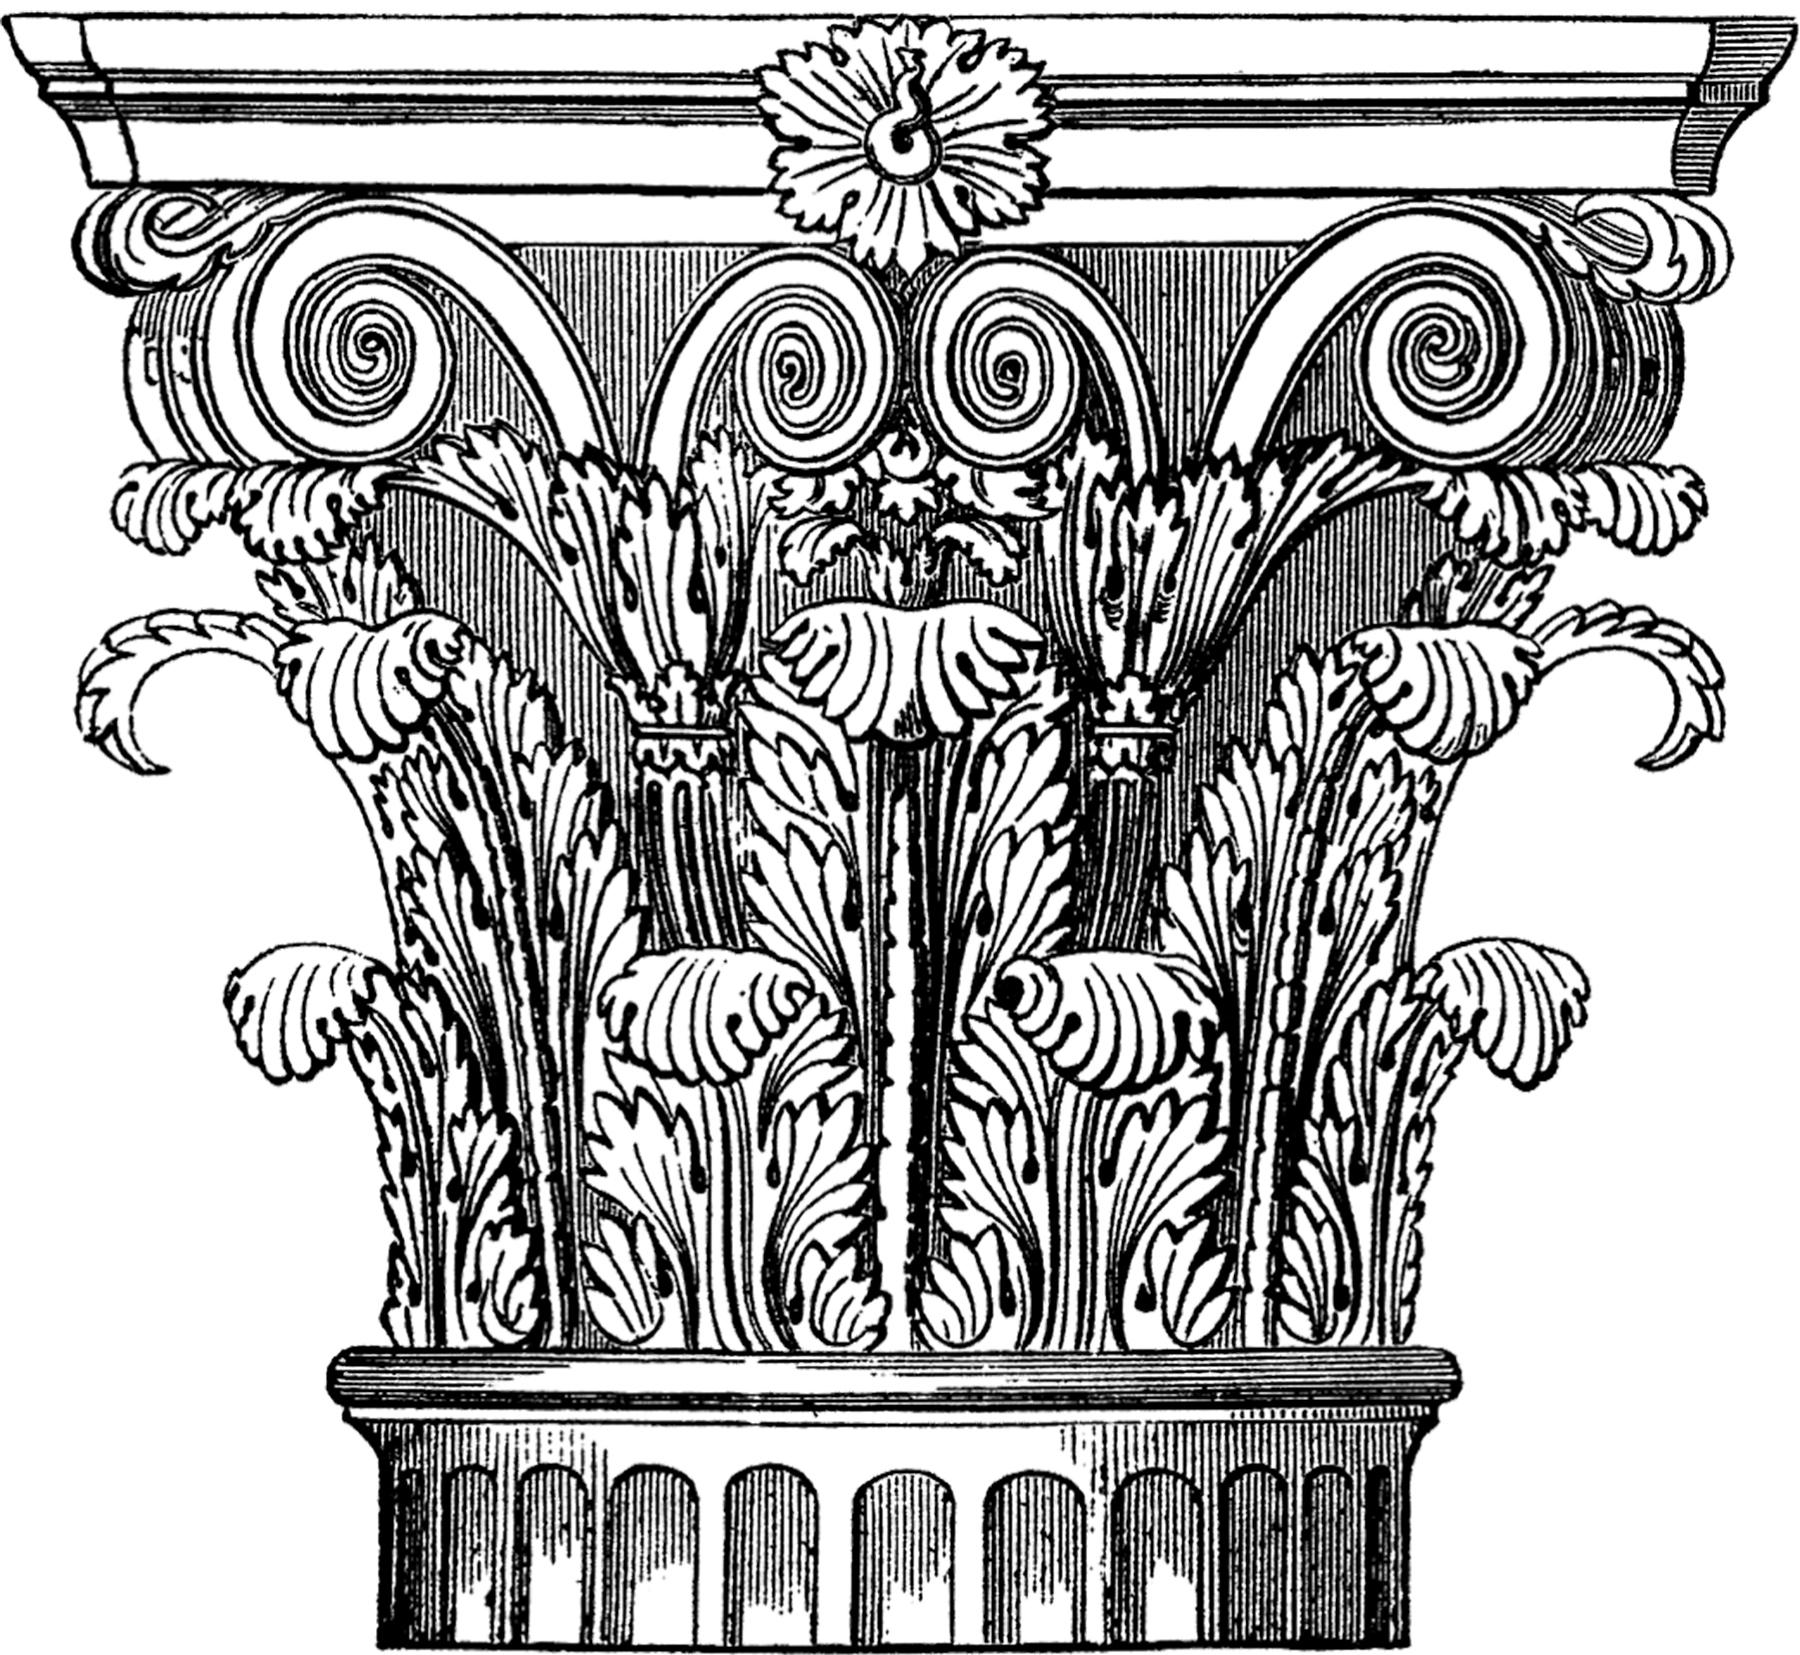 Ornate Corinthian Column Image The Graphics Fairy